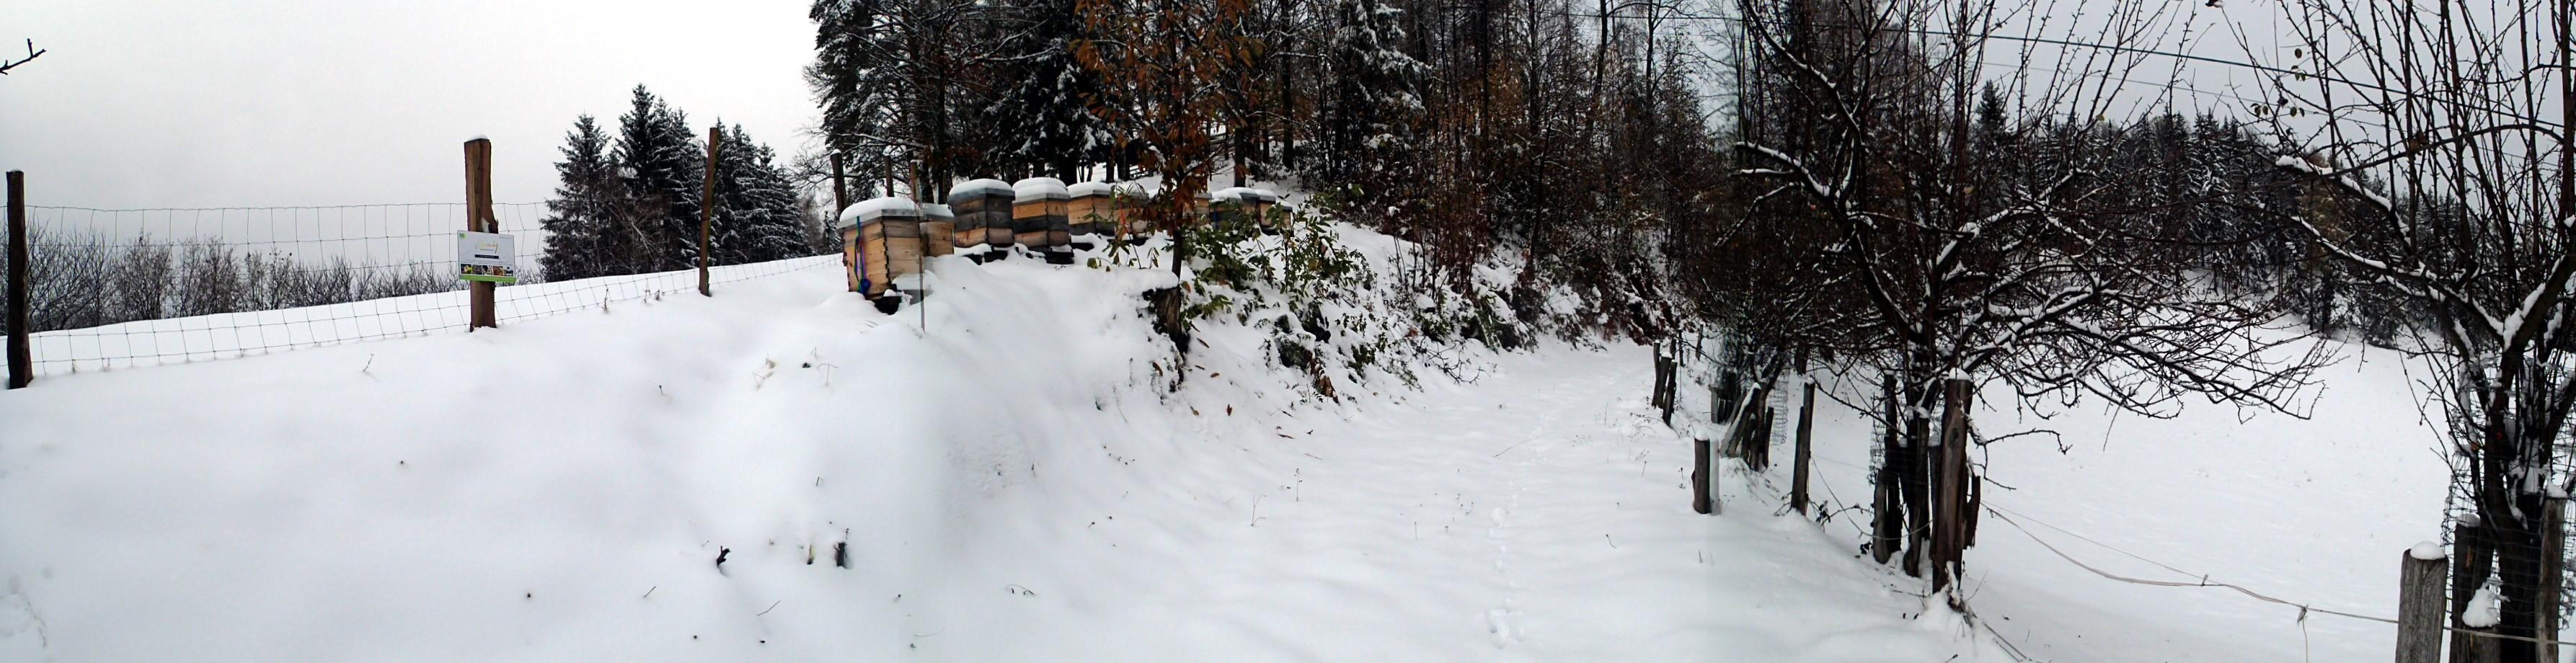 Osterberg Winter 2018_19